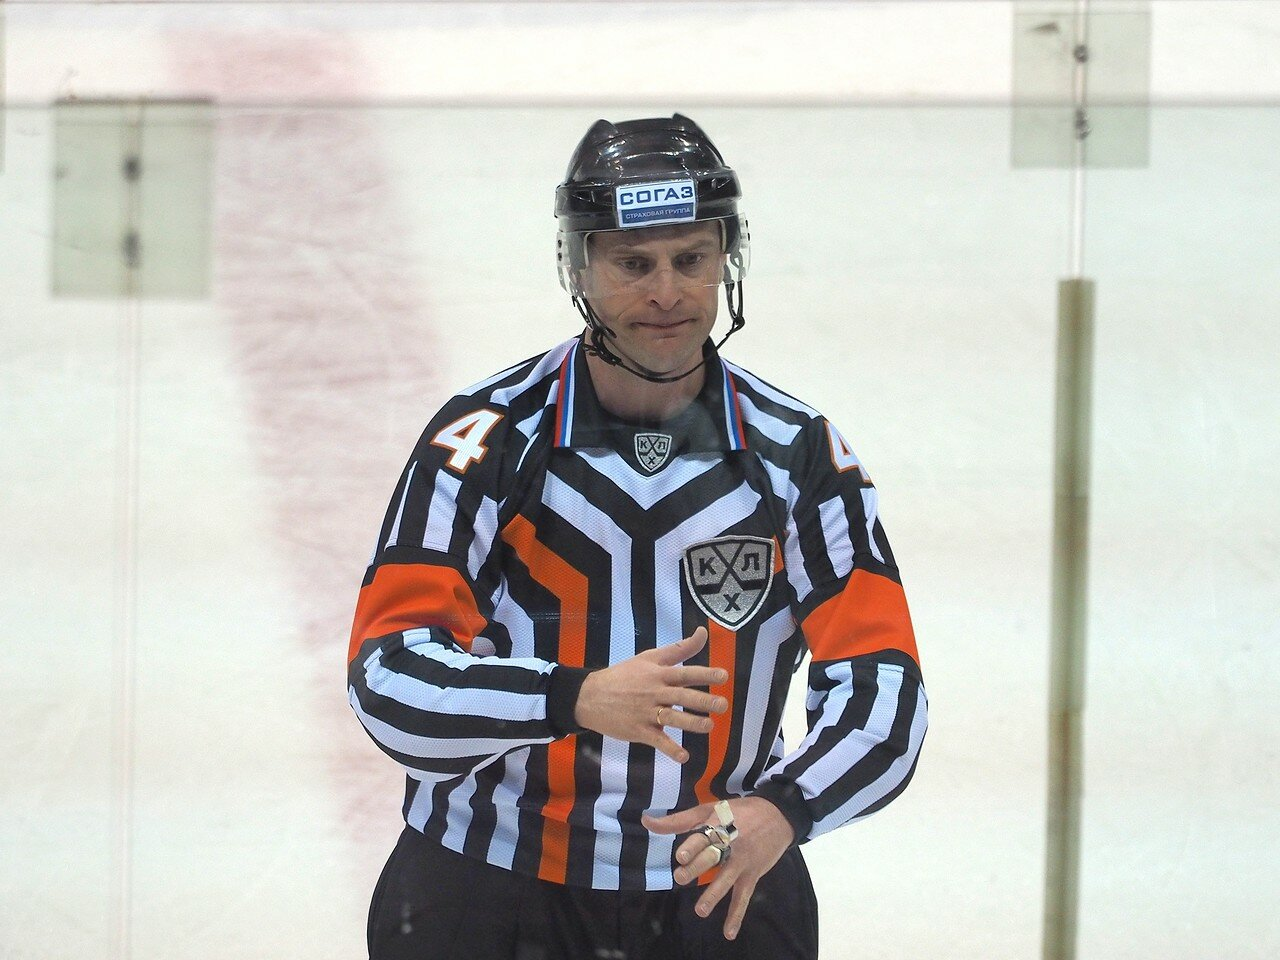 77Плей-офф 2016 Восток 1/2 Металлург - Сибирь 10.03.2016